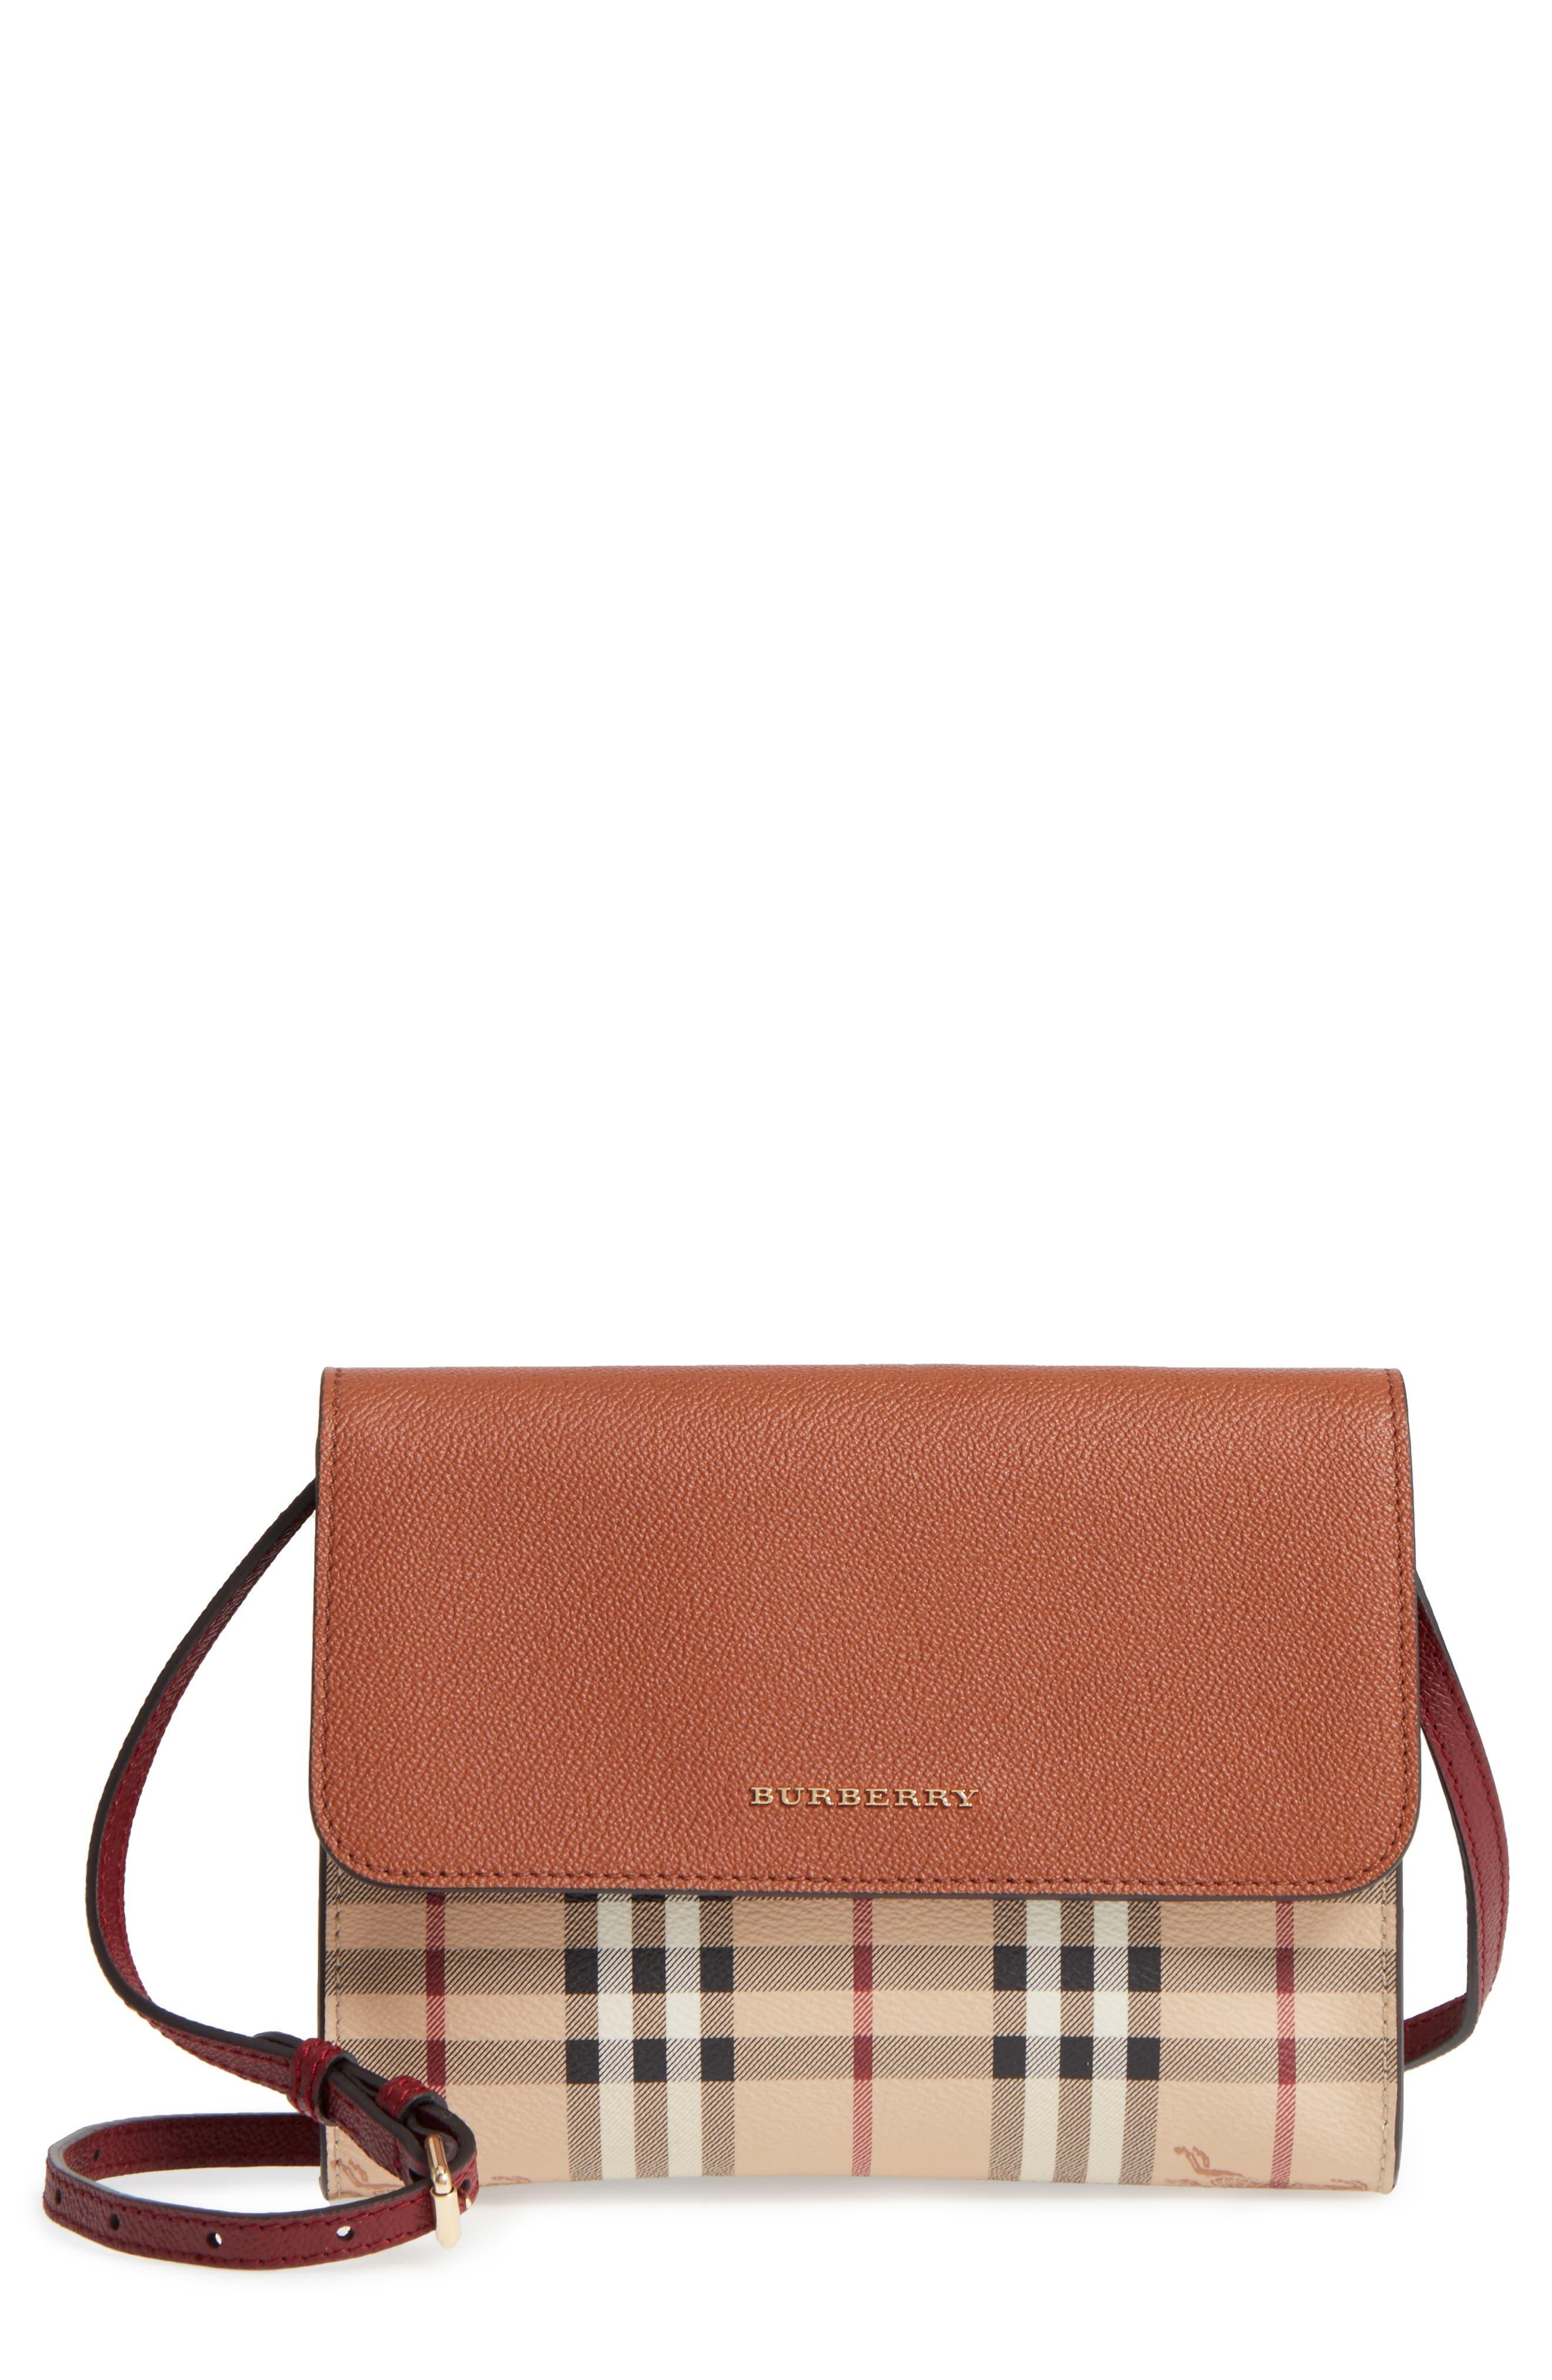 Peyton Check Coated Canvas & Leather Crossbody Bag,                             Main thumbnail 1, color,                             265